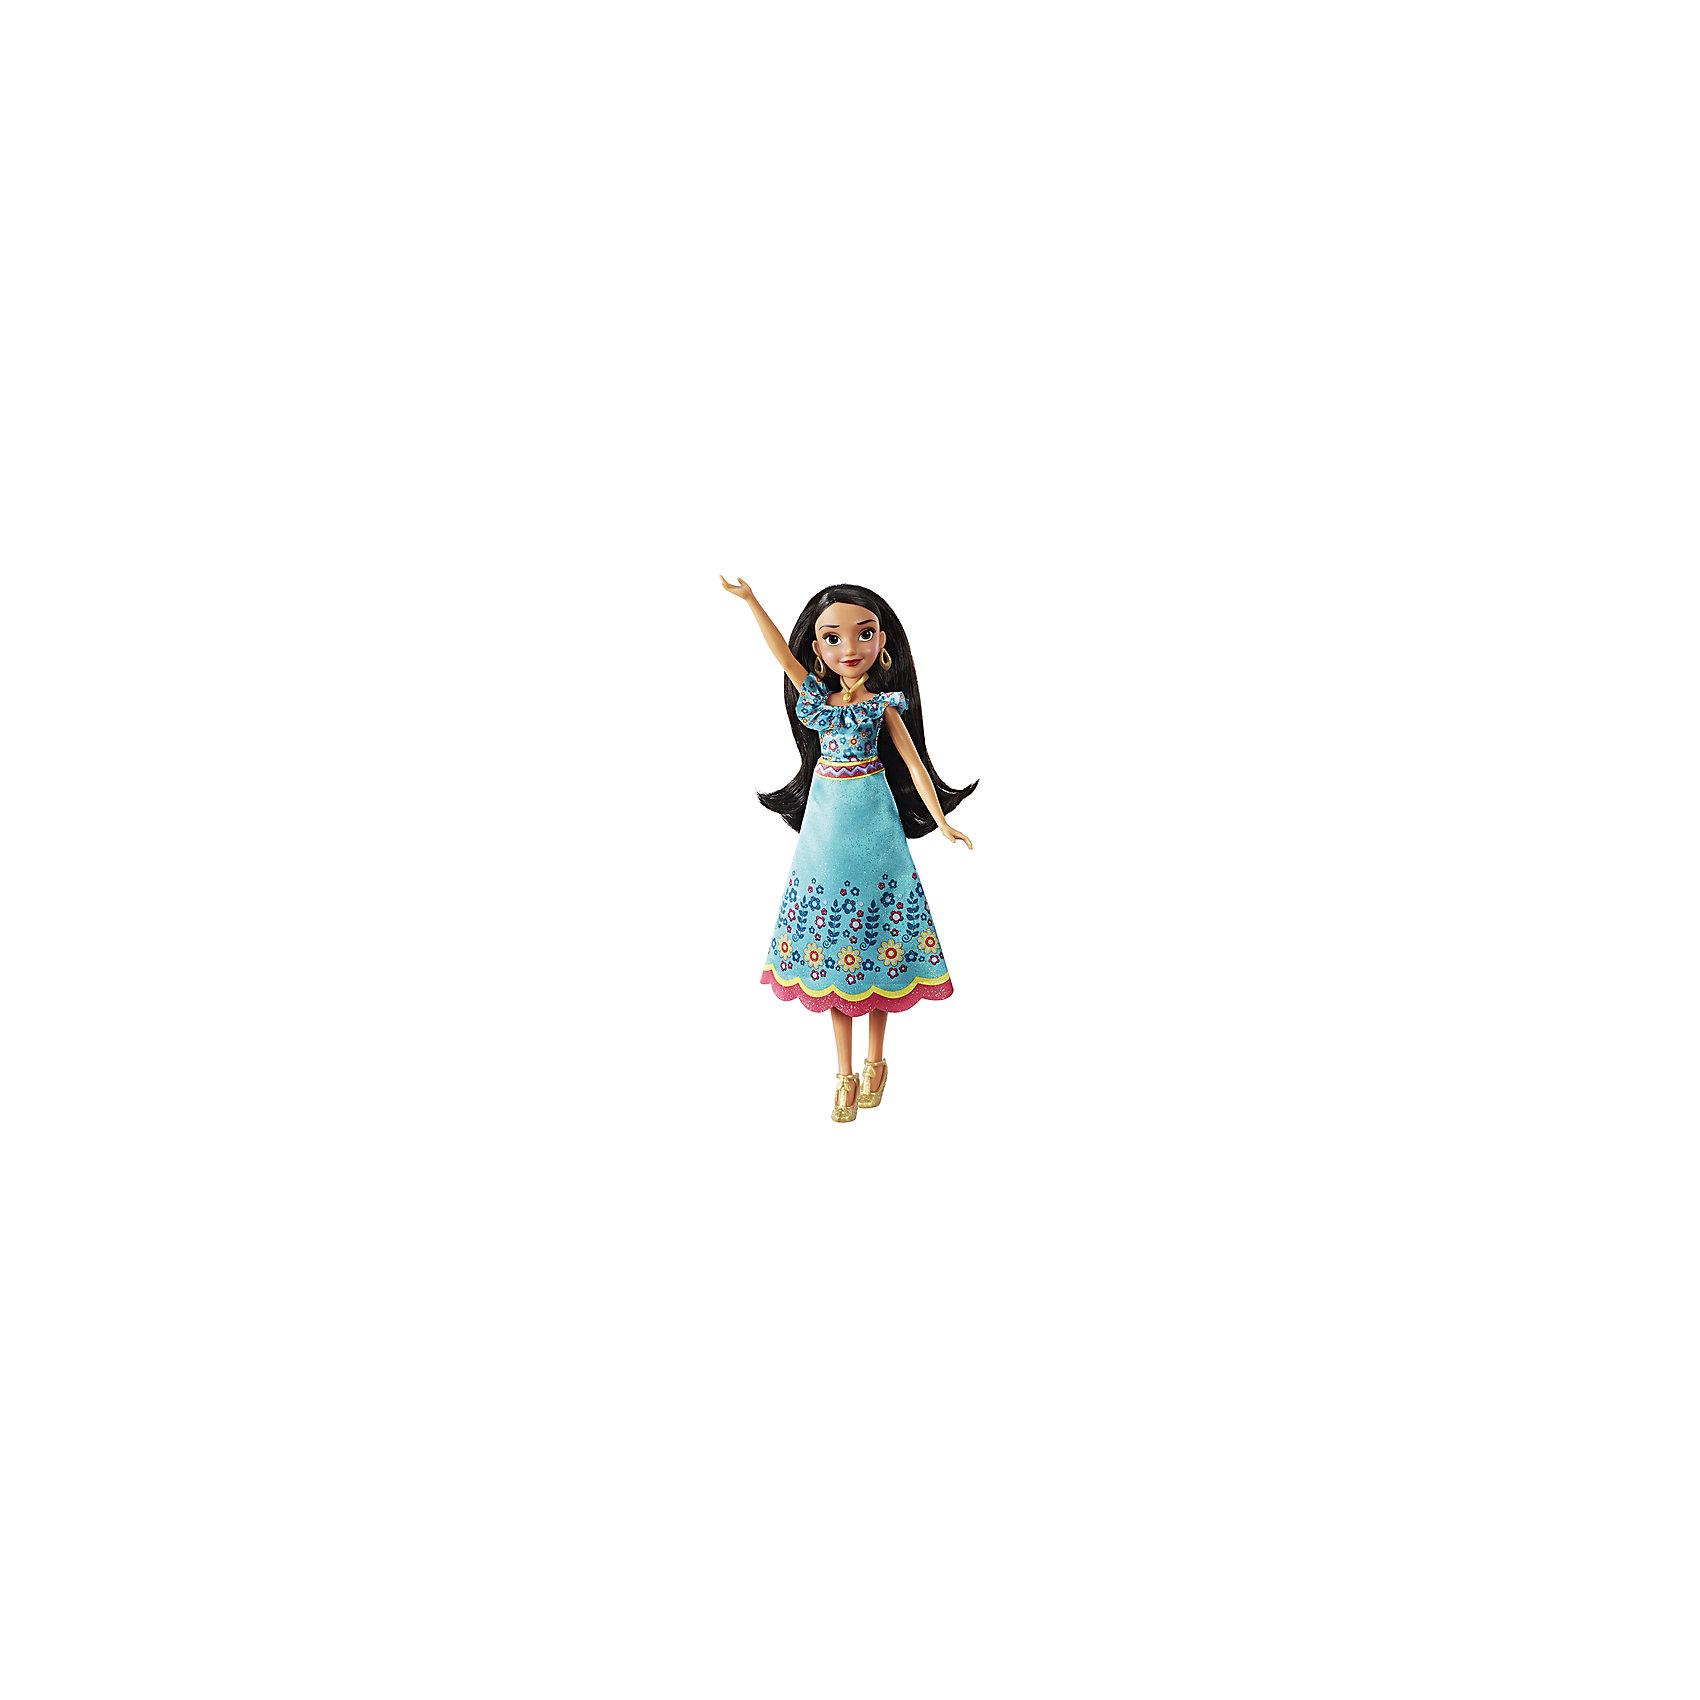 Кукла Hasbro Елена - принцесса Авалона, ЕленаКуклы-модели<br><br><br>Ширина мм: 9999<br>Глубина мм: 9999<br>Высота мм: 9999<br>Вес г: 9999<br>Возраст от месяцев: 36<br>Возраст до месяцев: 120<br>Пол: Женский<br>Возраст: Детский<br>SKU: 7097973